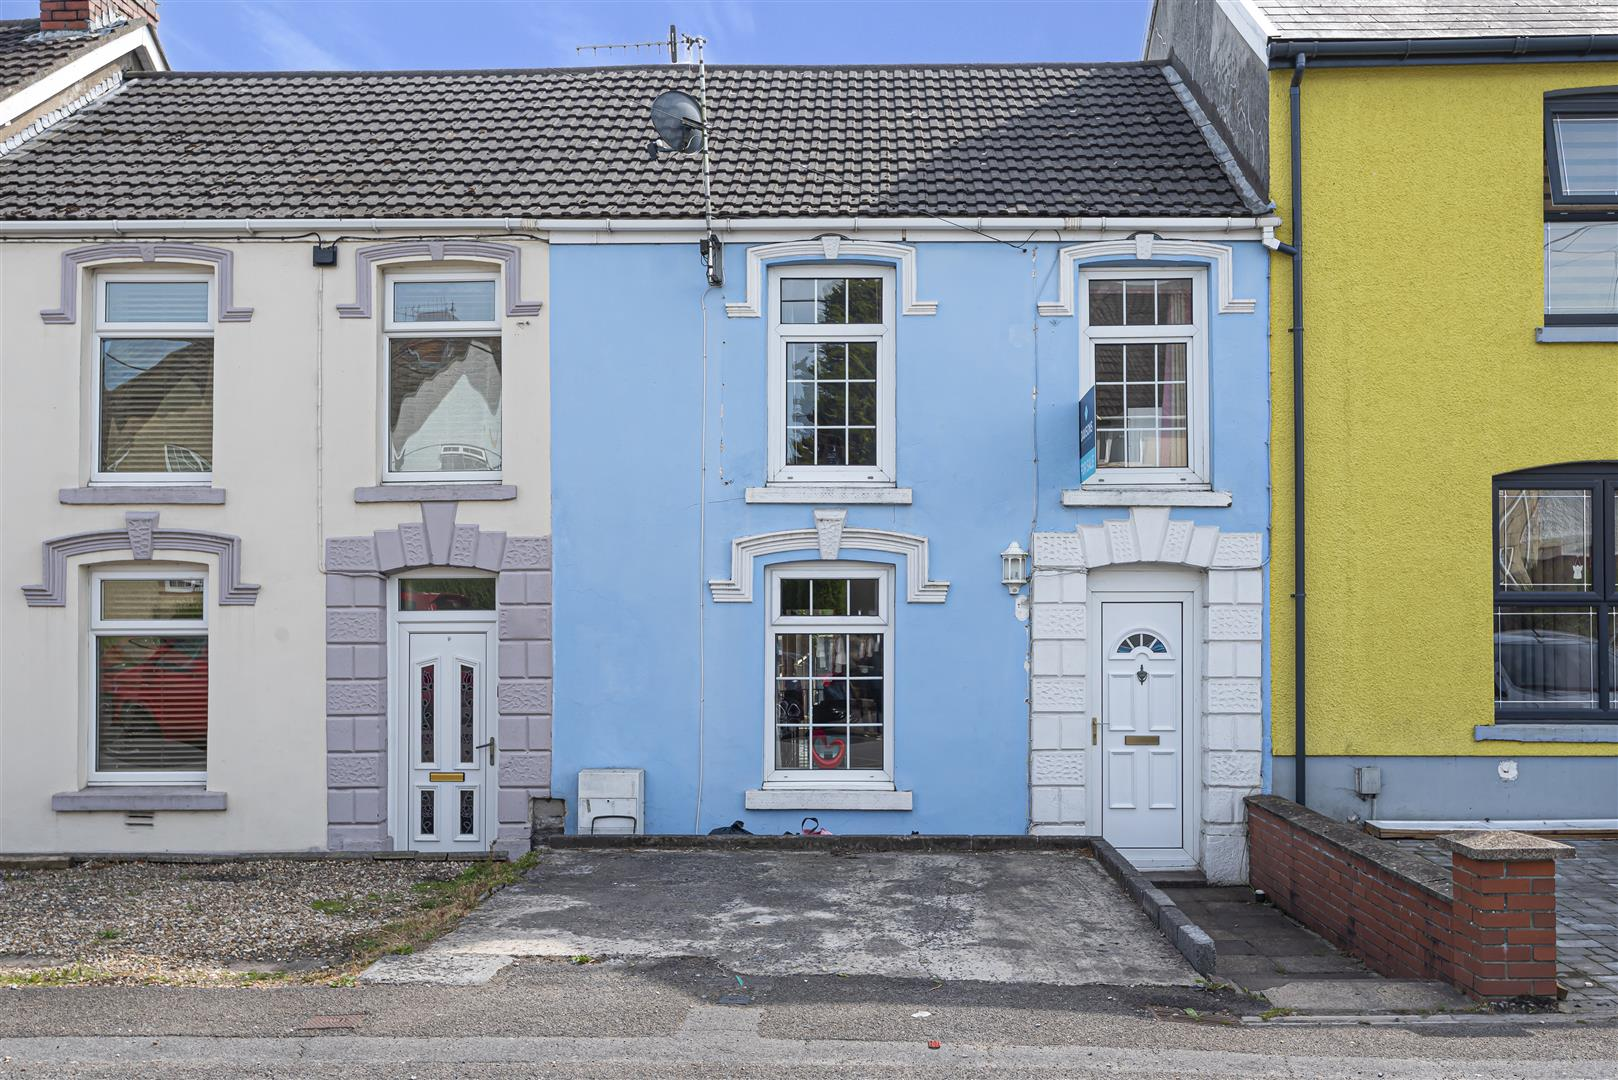 Culfor Road, Loughor, Swansea, SA4 6UA